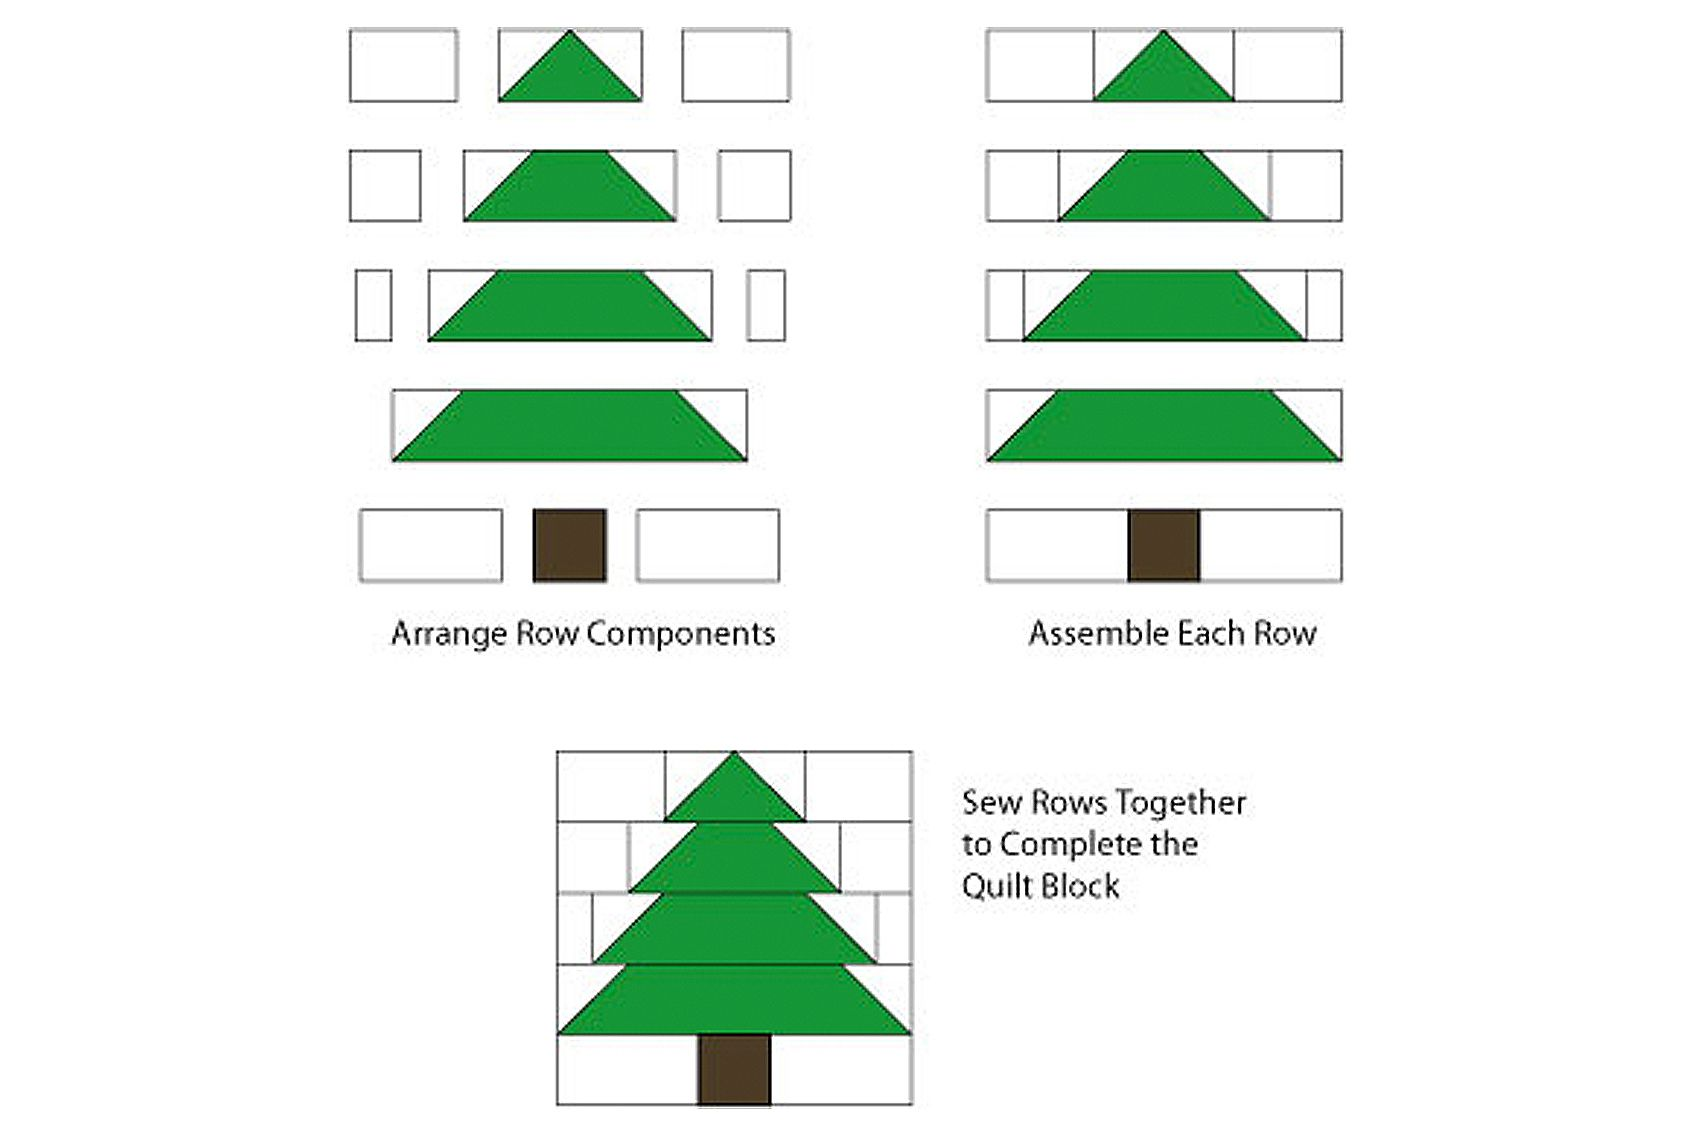 Easy Patchwork Christmas Tree Quilt Block Pattern : pine tree quilt block - Adamdwight.com